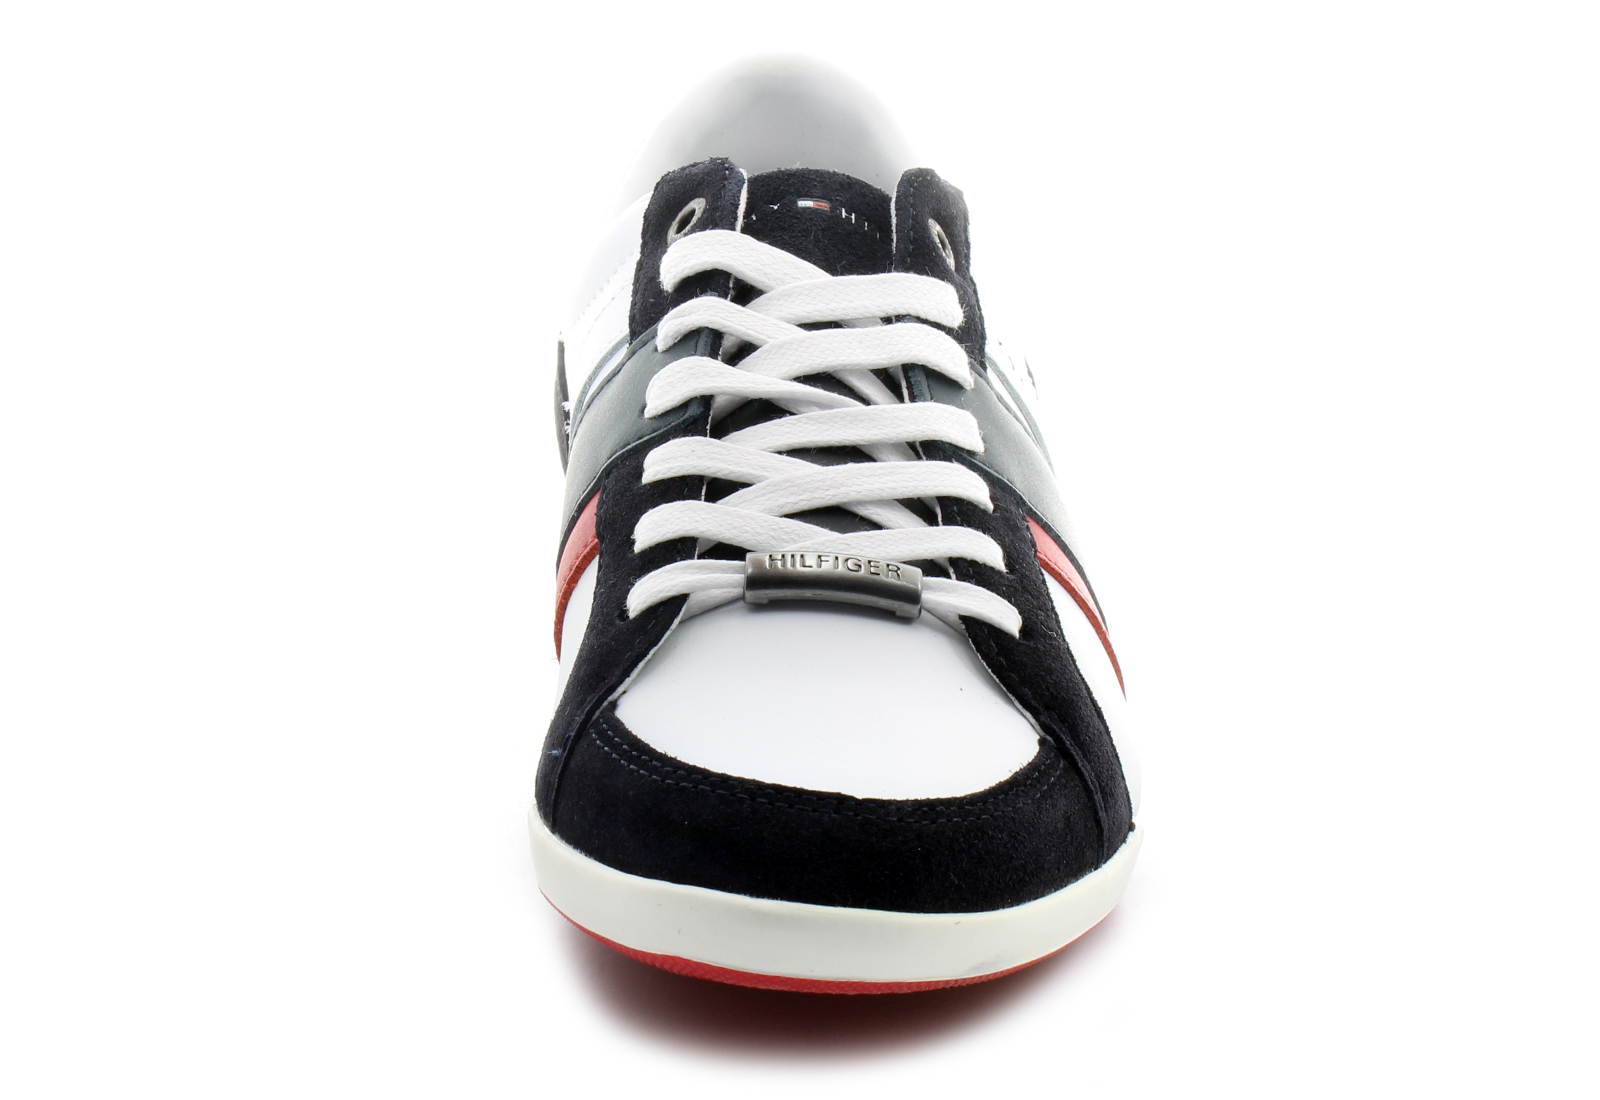 eca7158535 Tommy Hilfiger Cipő - Royal 3c1 - 17S-0410-909 - Office Shoes ...